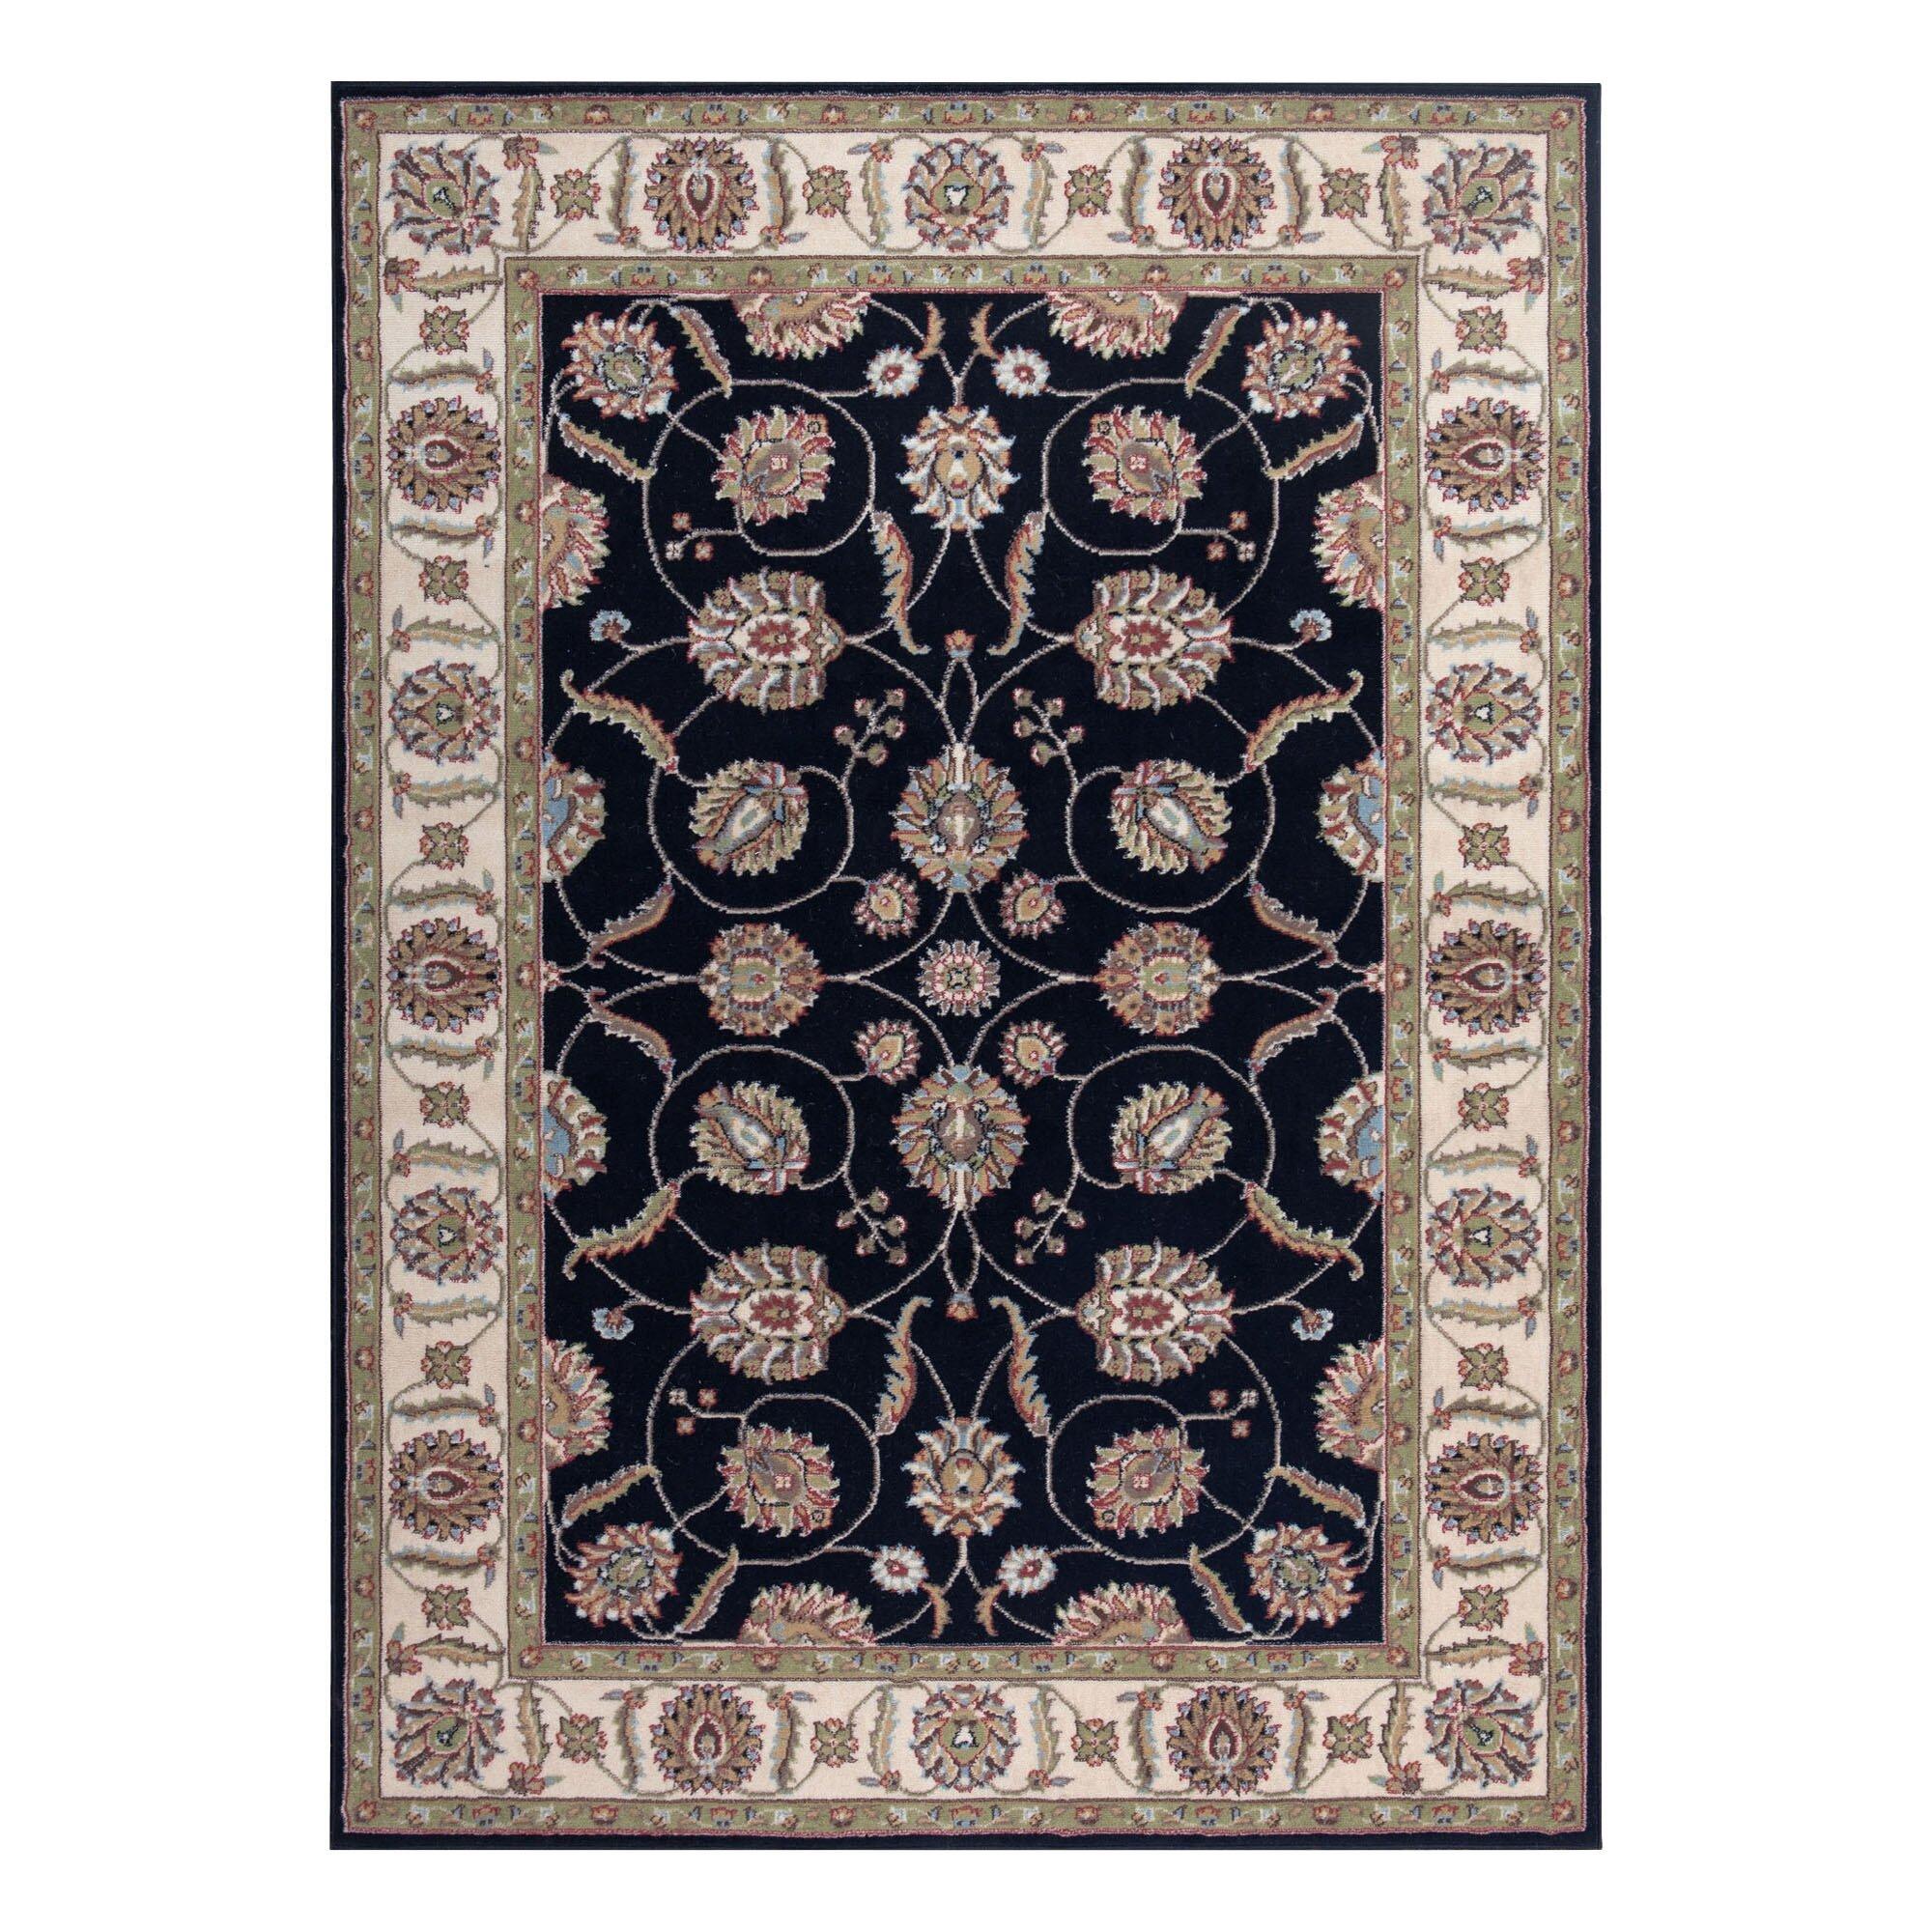 andover mills refton black gray area rug reviews wayfair. Black Bedroom Furniture Sets. Home Design Ideas